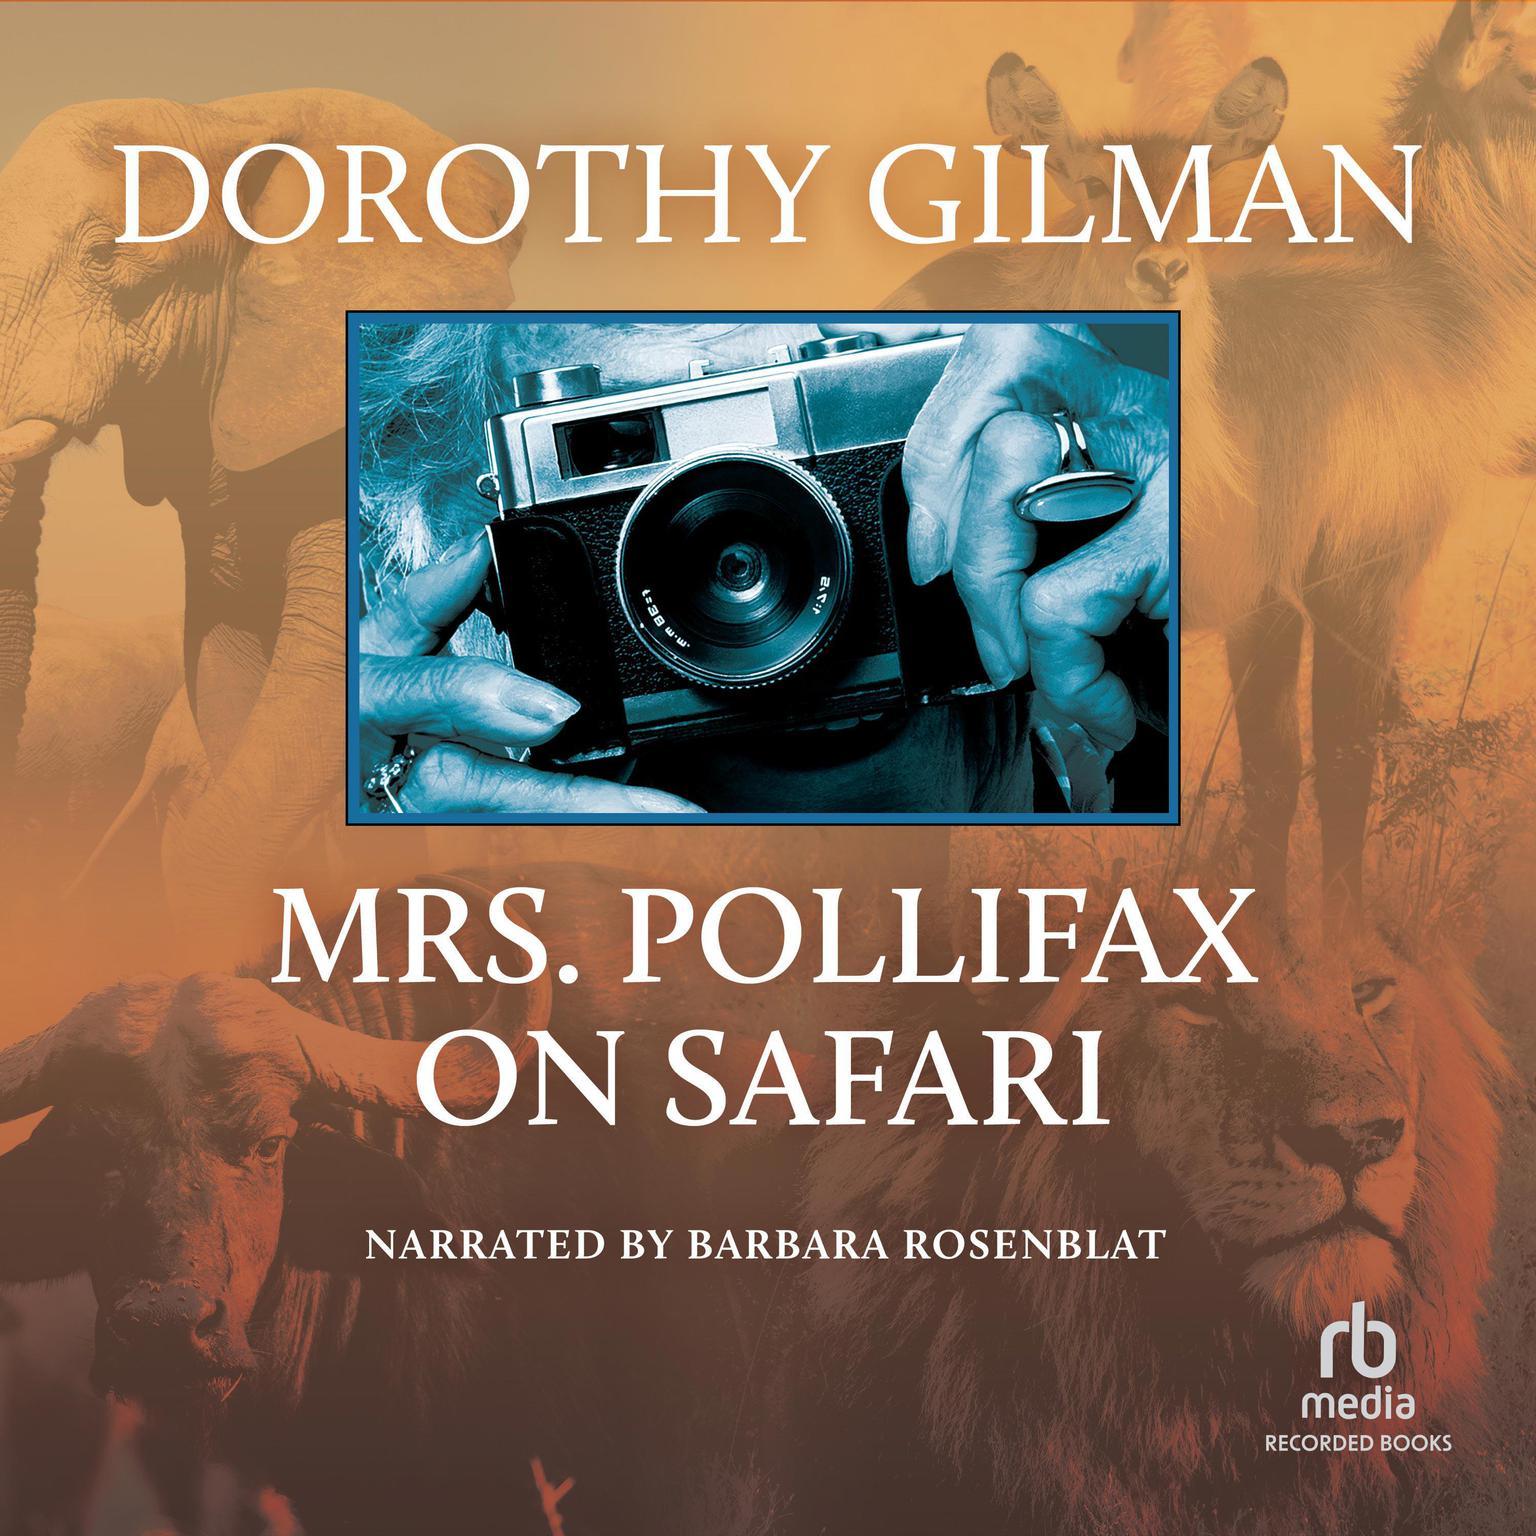 Mrs. Pollifax on Safari Audiobook, by Dorothy Gilman